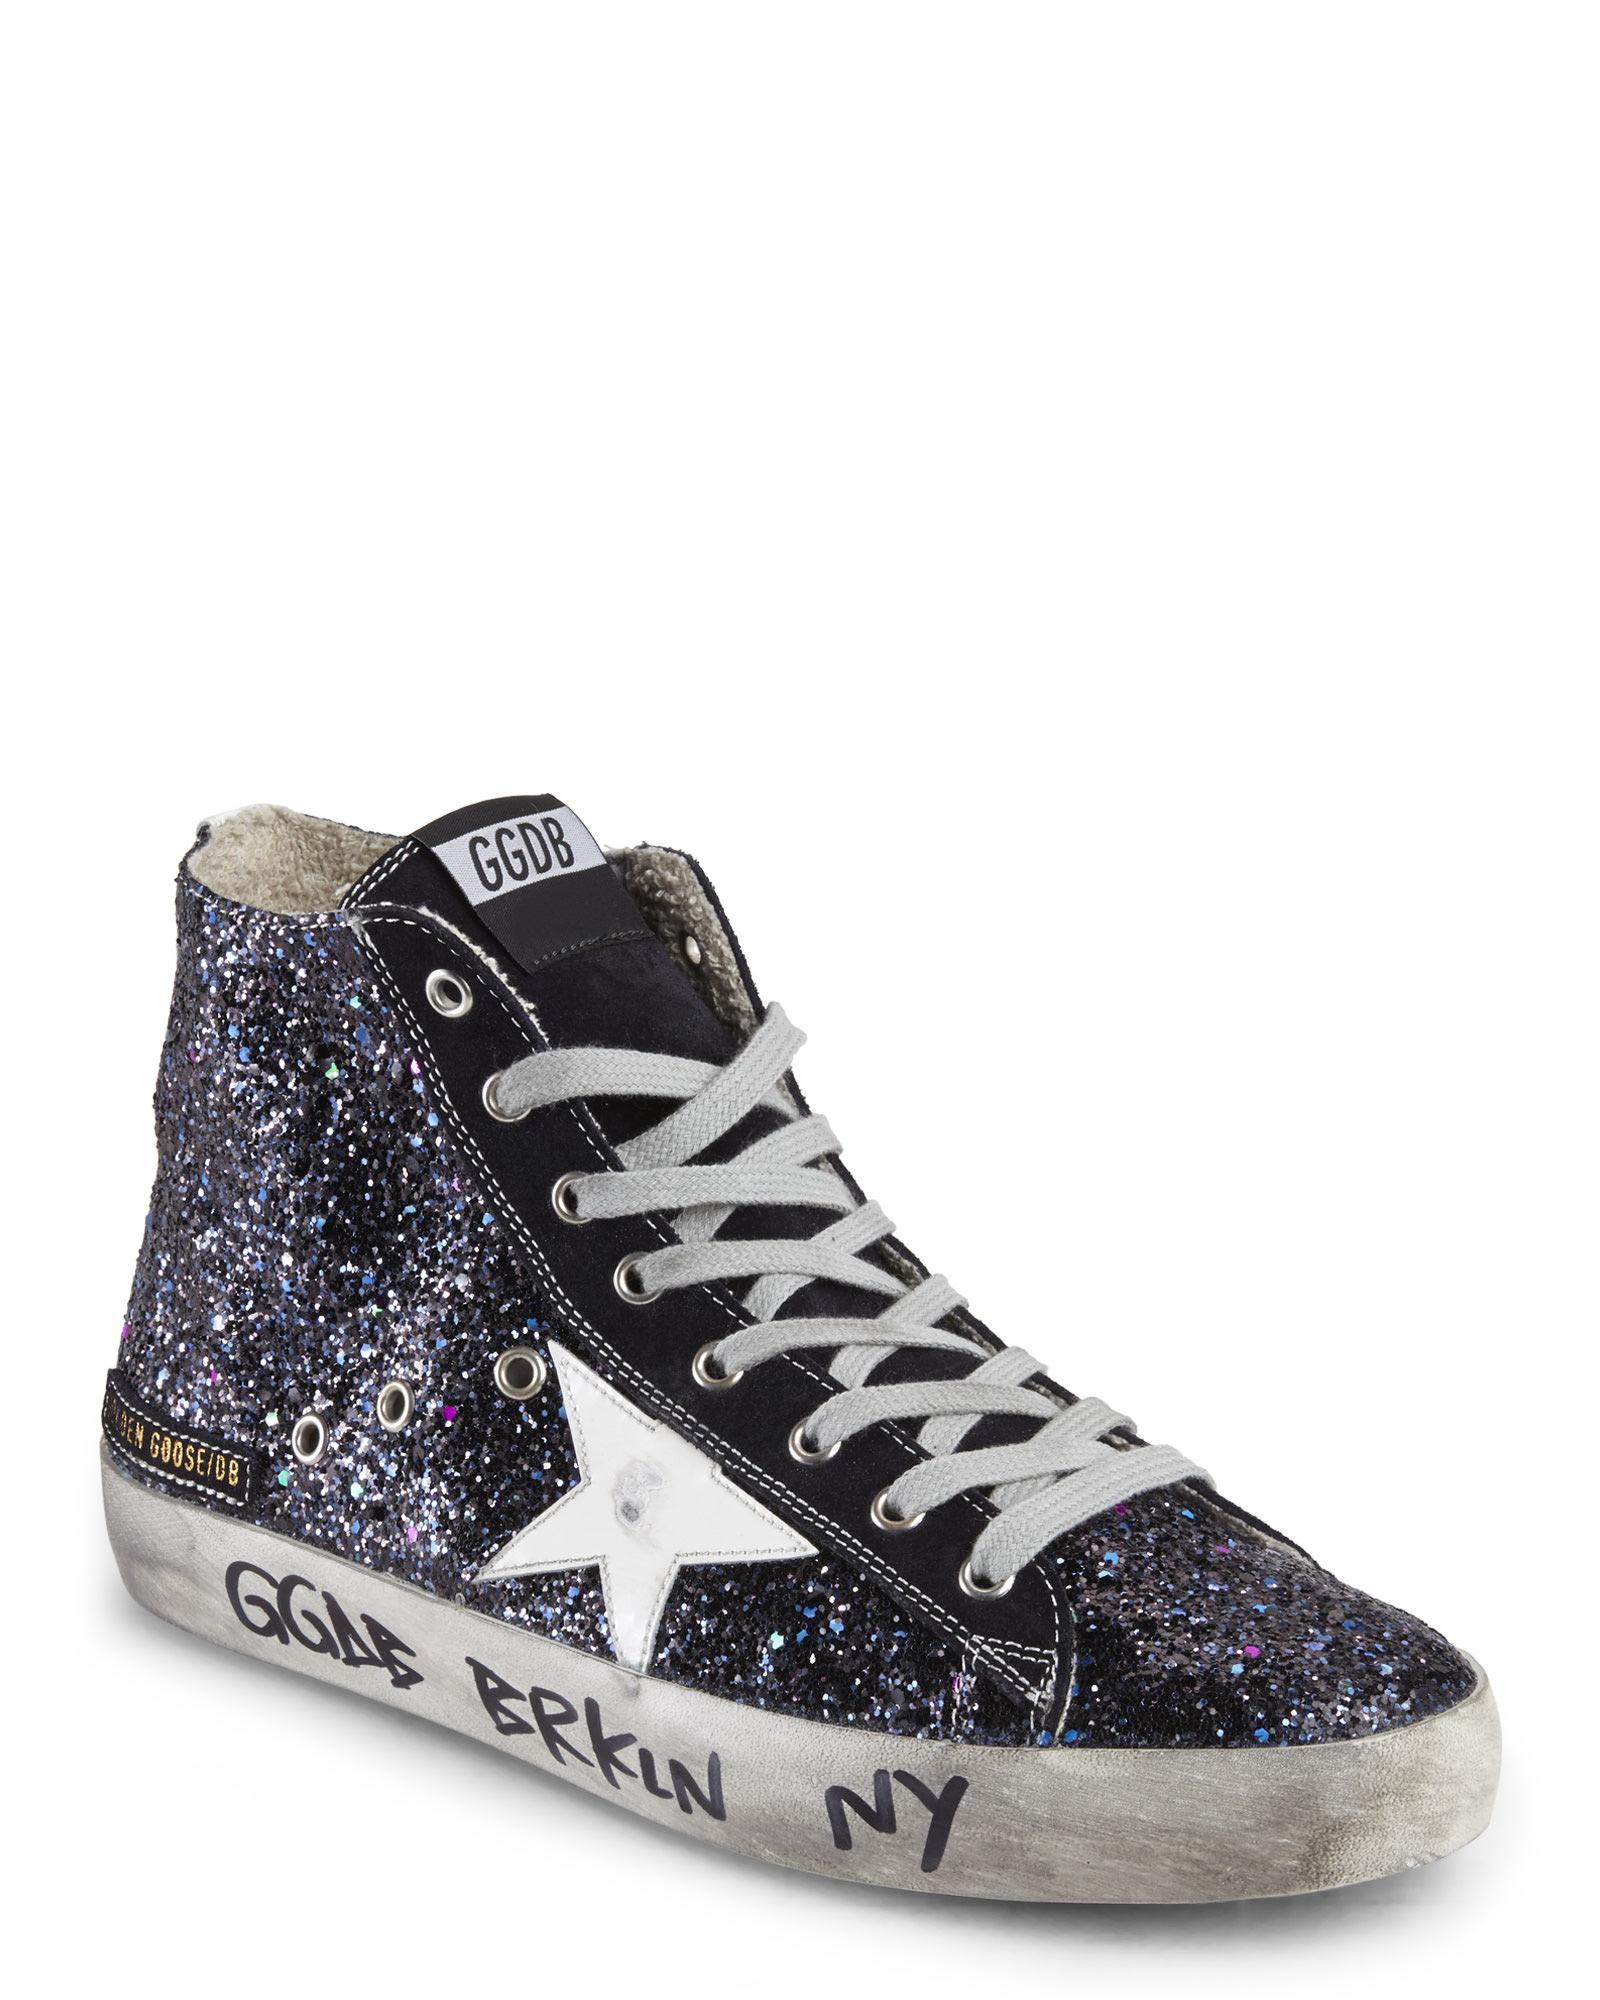 5d4ad6fee58c Golden Goose Deluxe Brand Black Francy Glitter High-Top Sneakers in ...